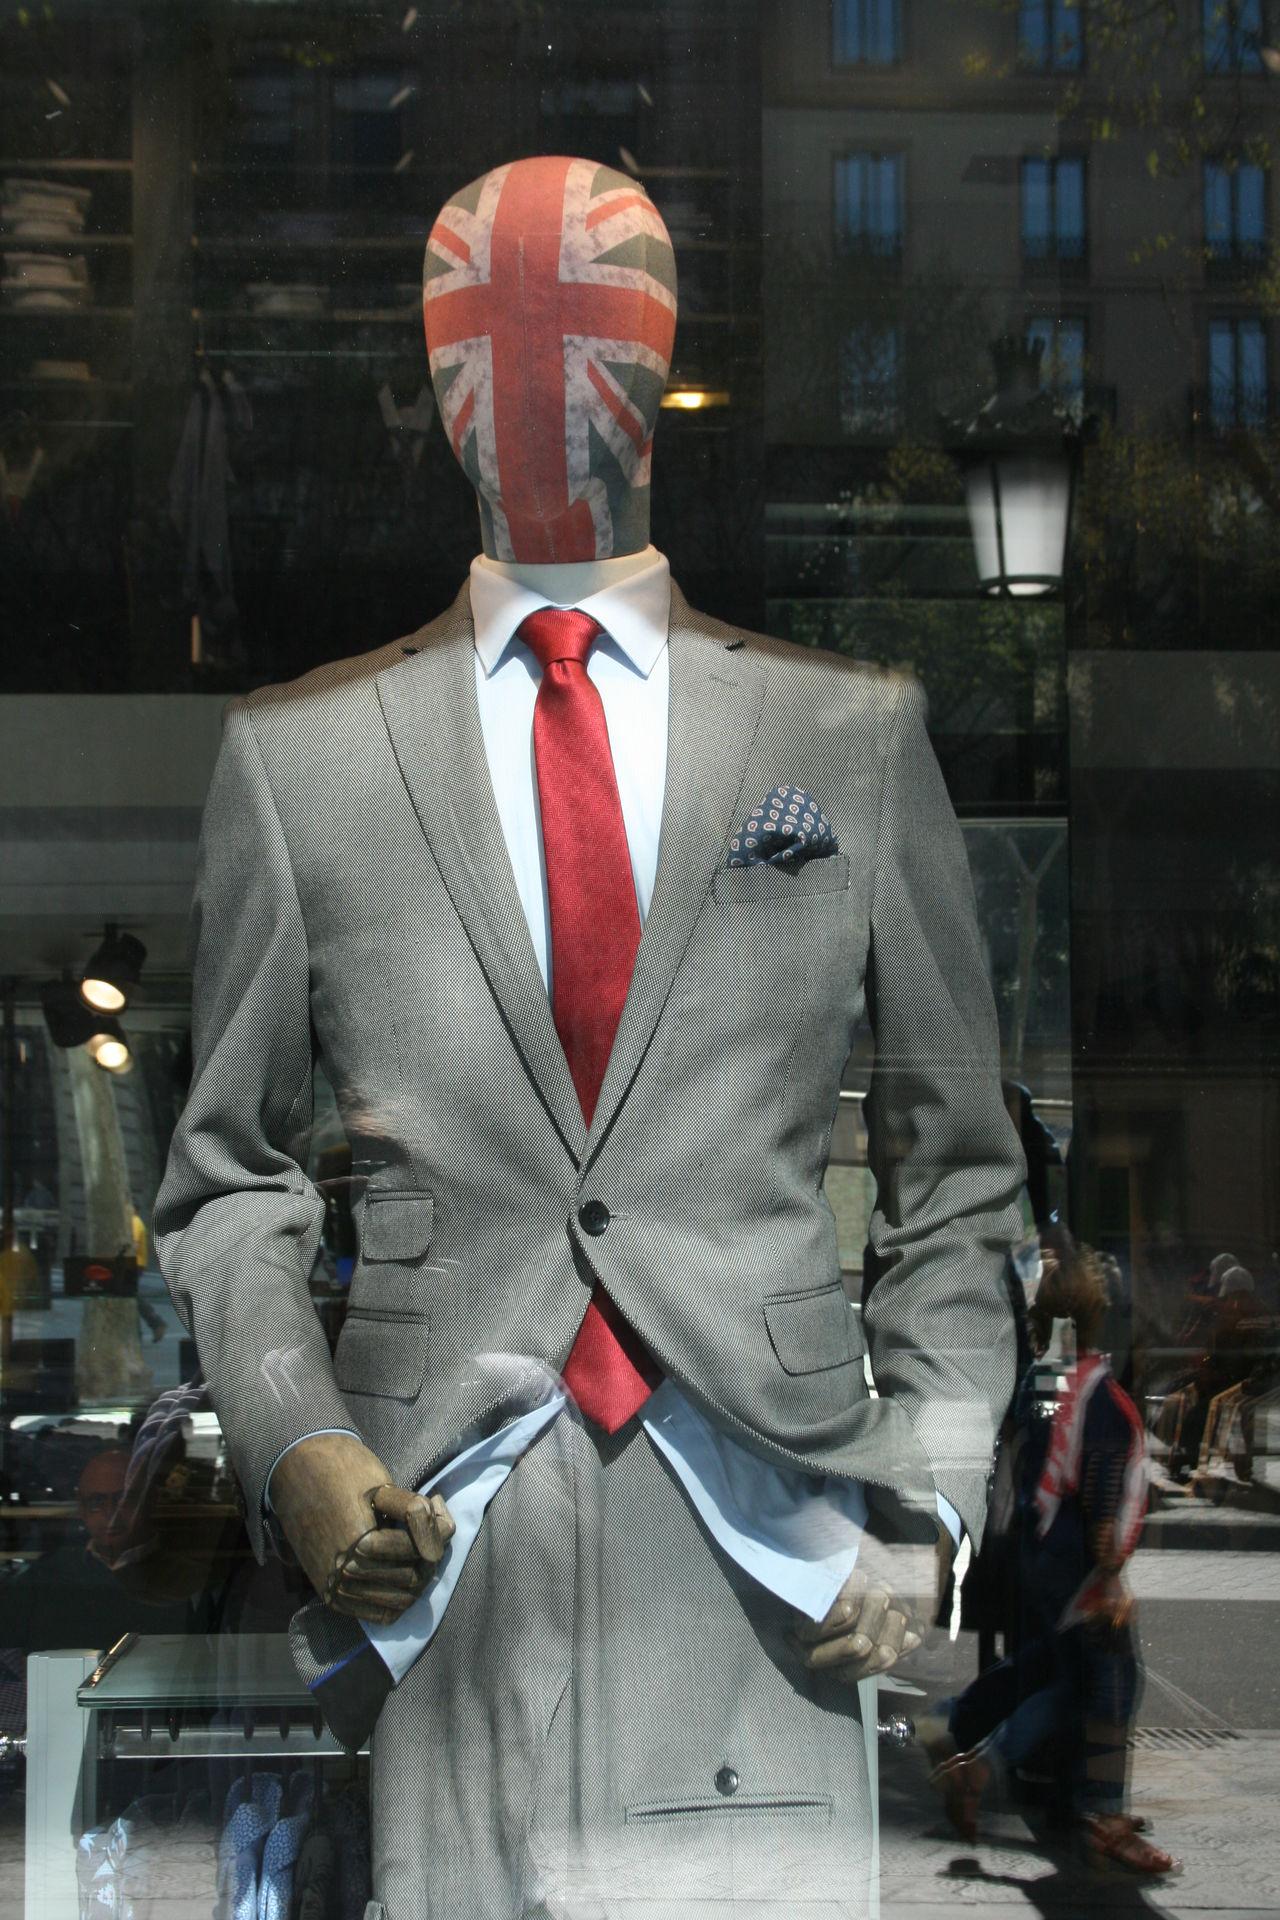 Adult Adults Only Britain Britains_talent British British Shorthair Business Businessman City Corporate Business Greatbritain Greatbritish King - Royal Person Mature Men Men Only Men Shirt And Tie Suit Suitedman Suitup Well-dressed